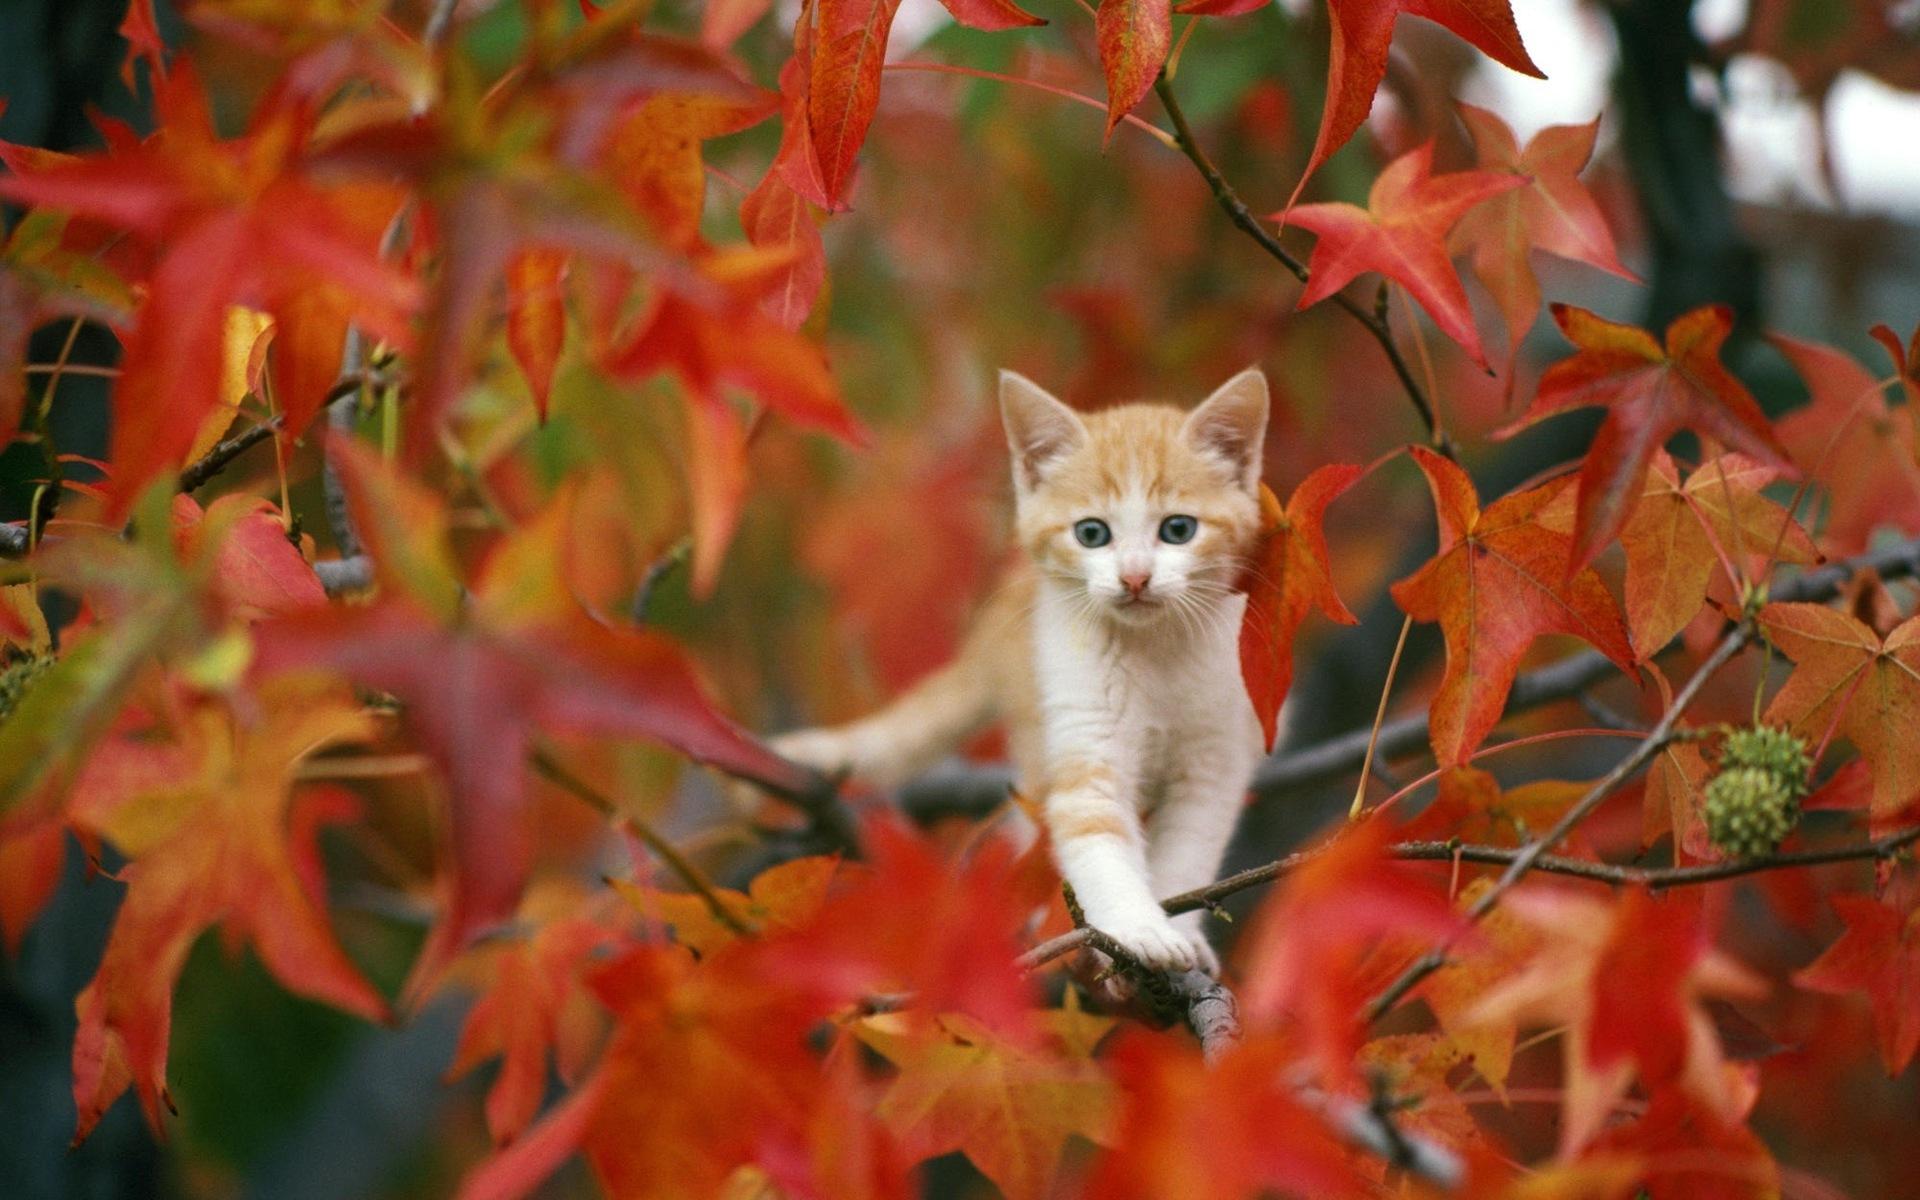 Cat in autumn 1920 x 1200 download close